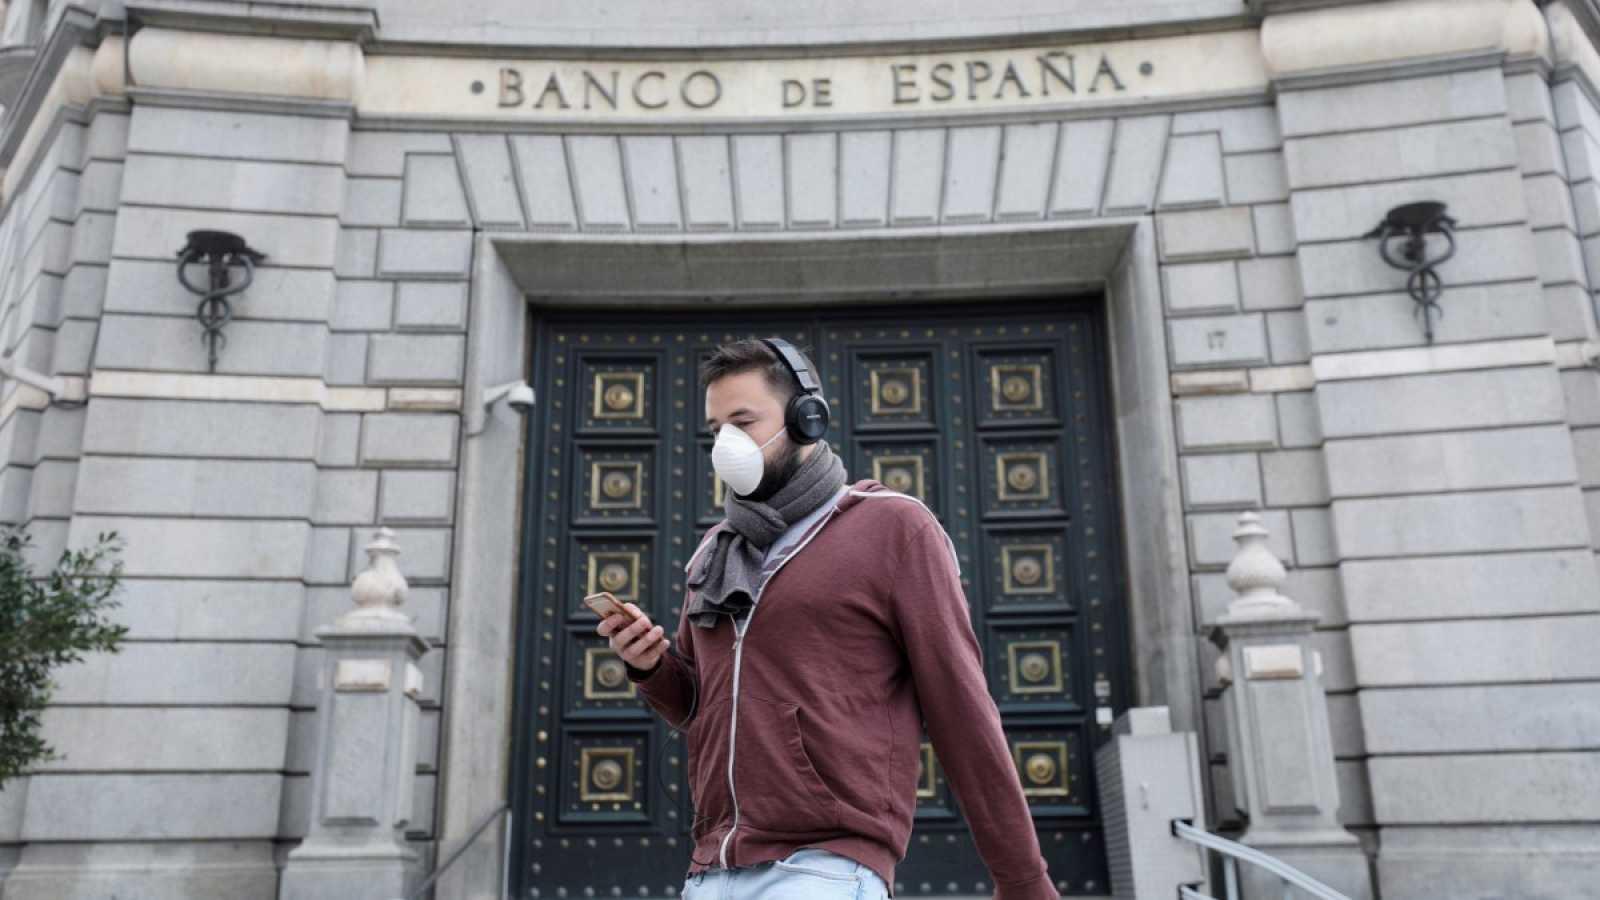 Un hombre camina con mascarilla frente al Banco de España en Madrid